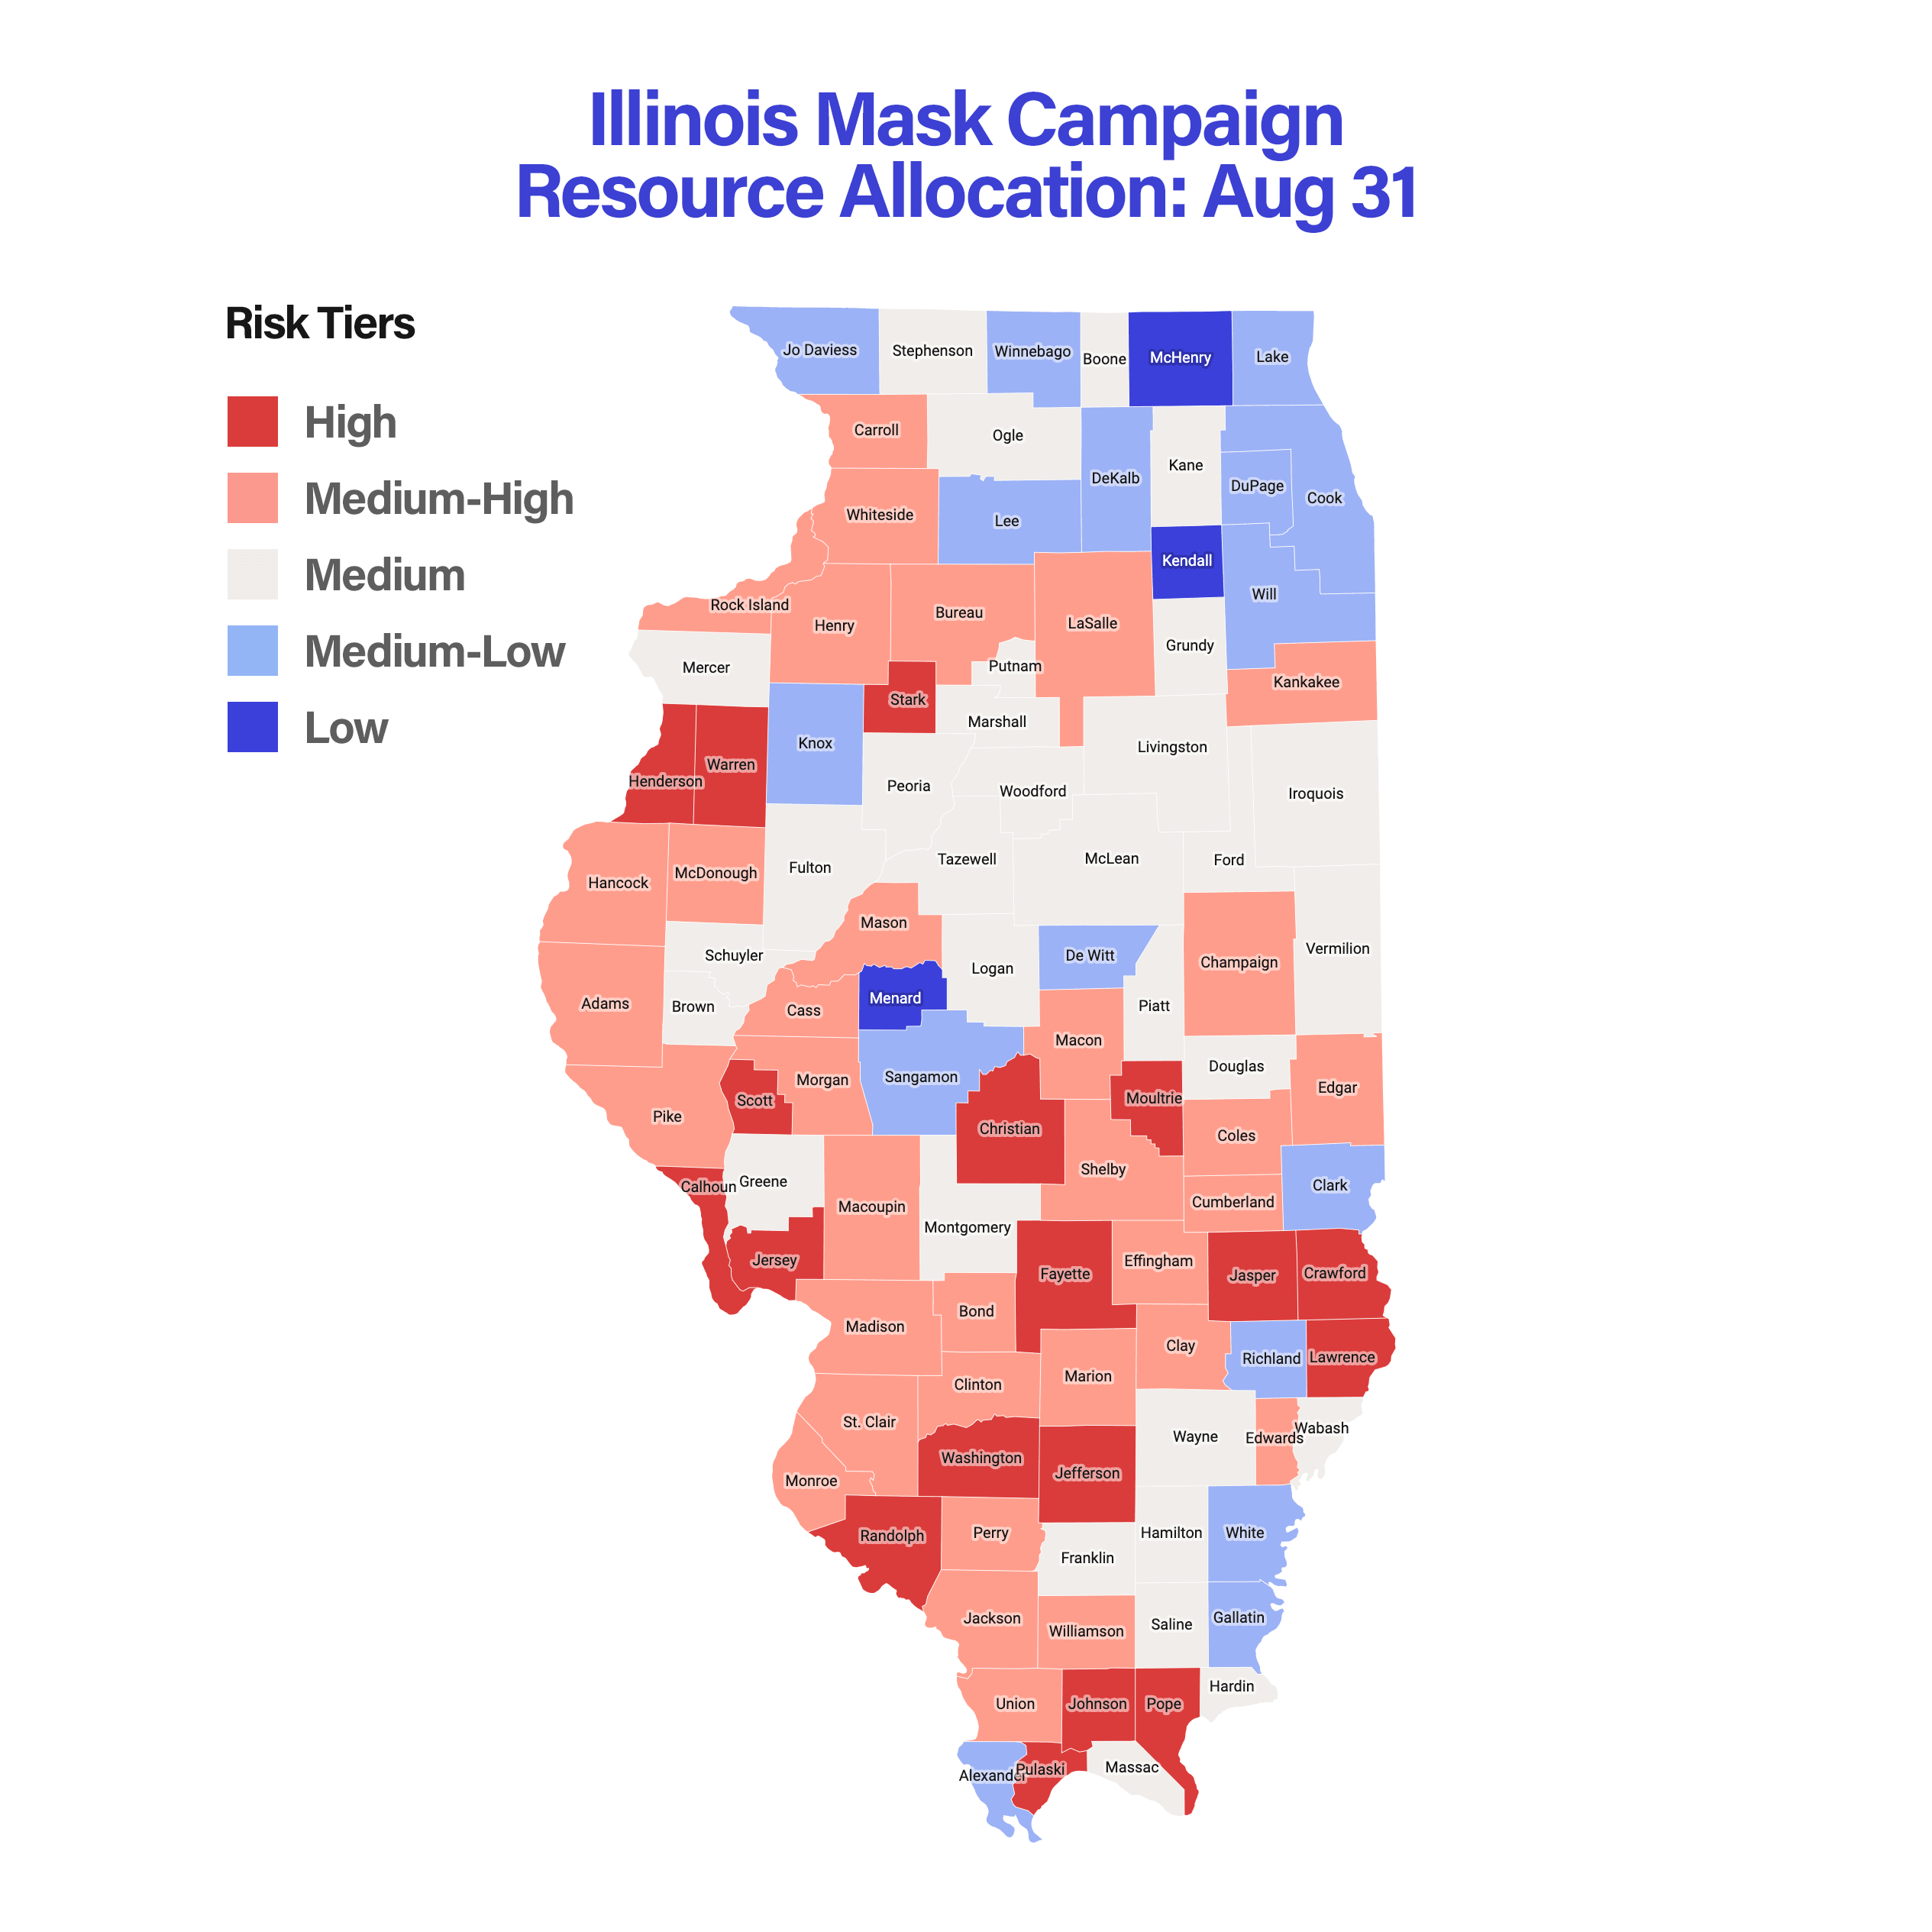 Illinois Mask Campaign Resource Allocation: Aug 31